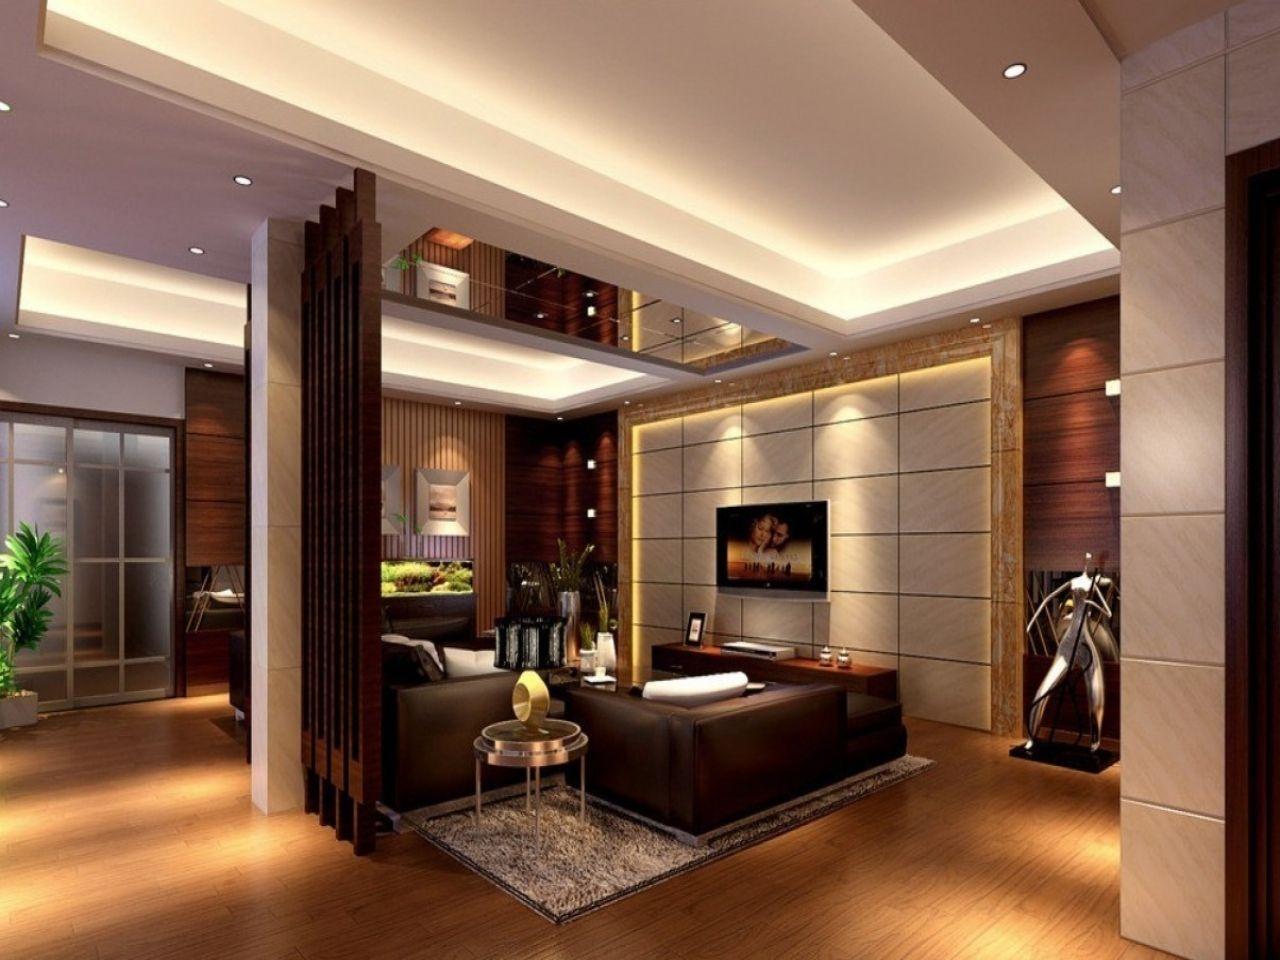 70 Duplex House Interior Designs Pictures Ideas Designs Duplex